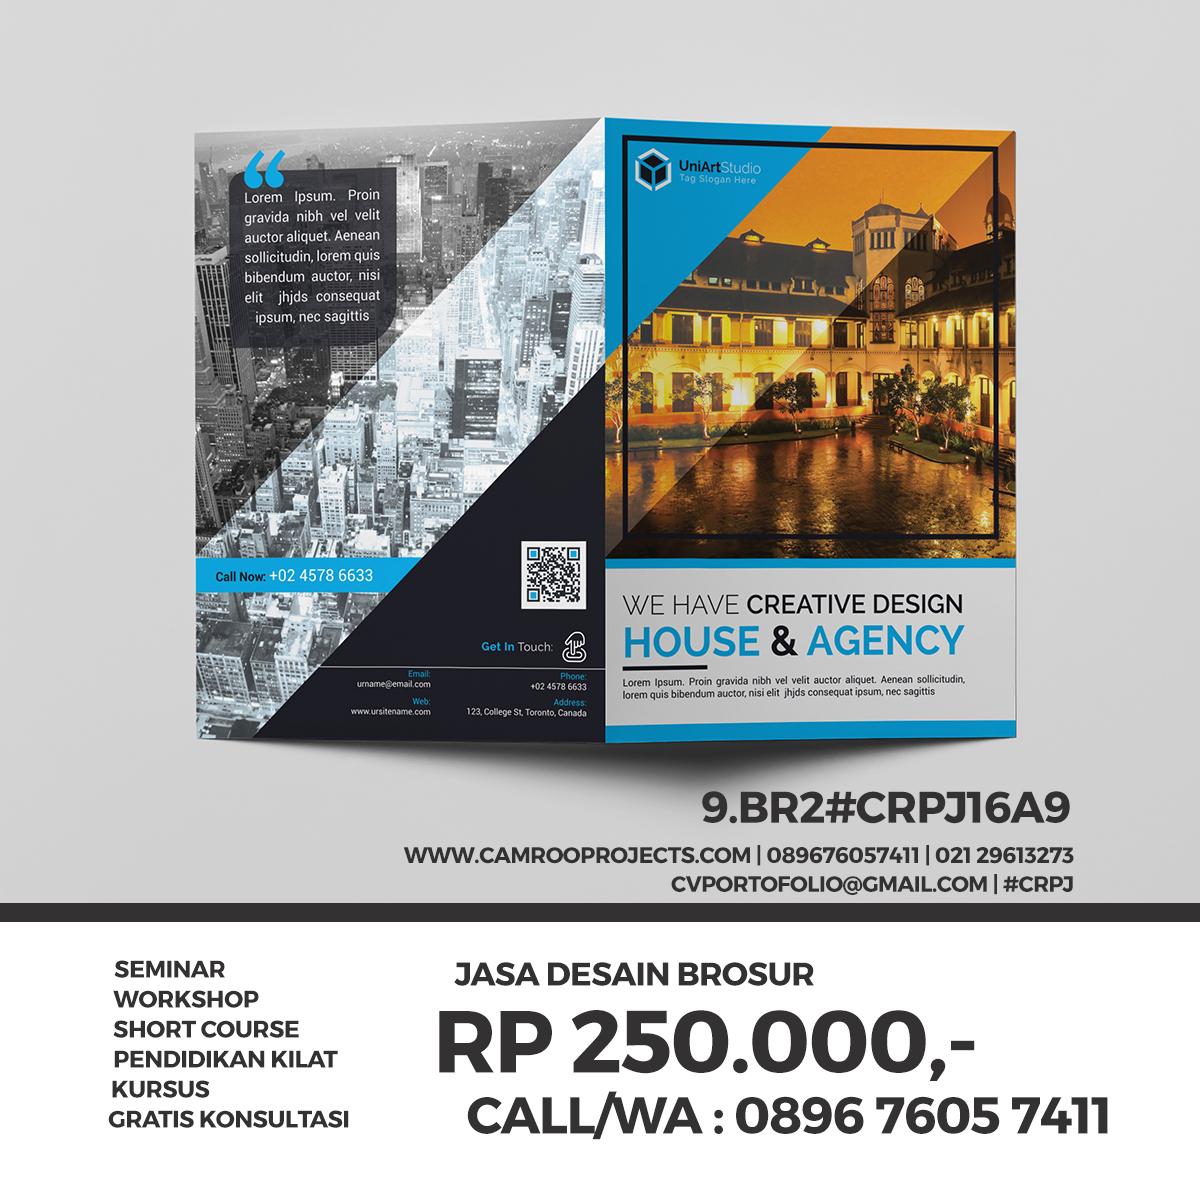 Jasa Desain spanduk di batam | Call/WA 0896 760 574 11